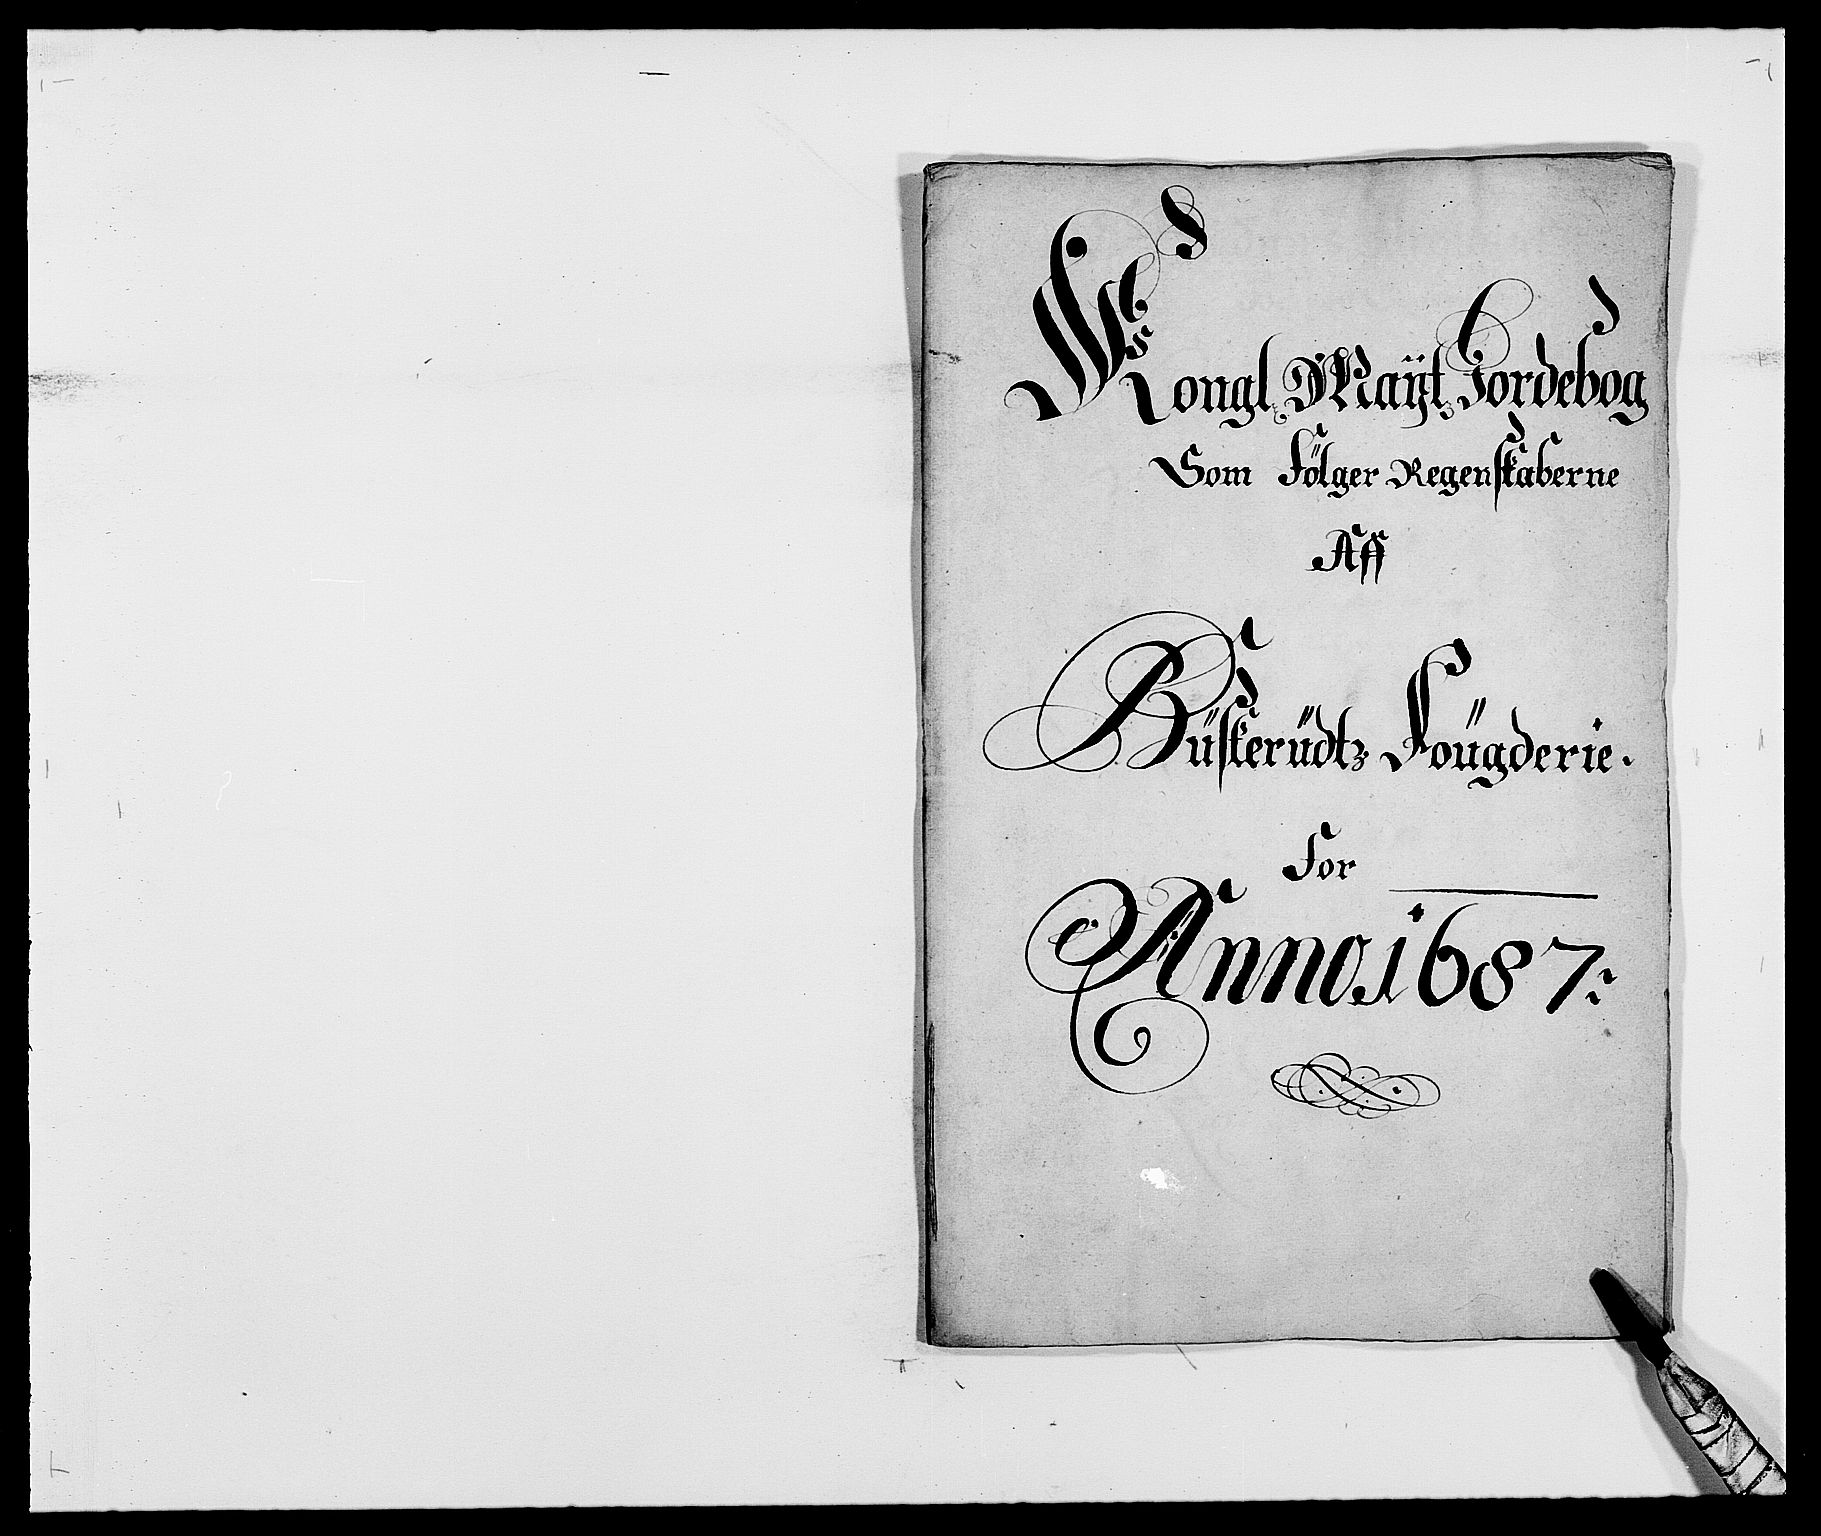 RA, Rentekammeret inntil 1814, Reviderte regnskaper, Fogderegnskap, R25/L1679: Fogderegnskap Buskerud, 1687-1688, s. 15